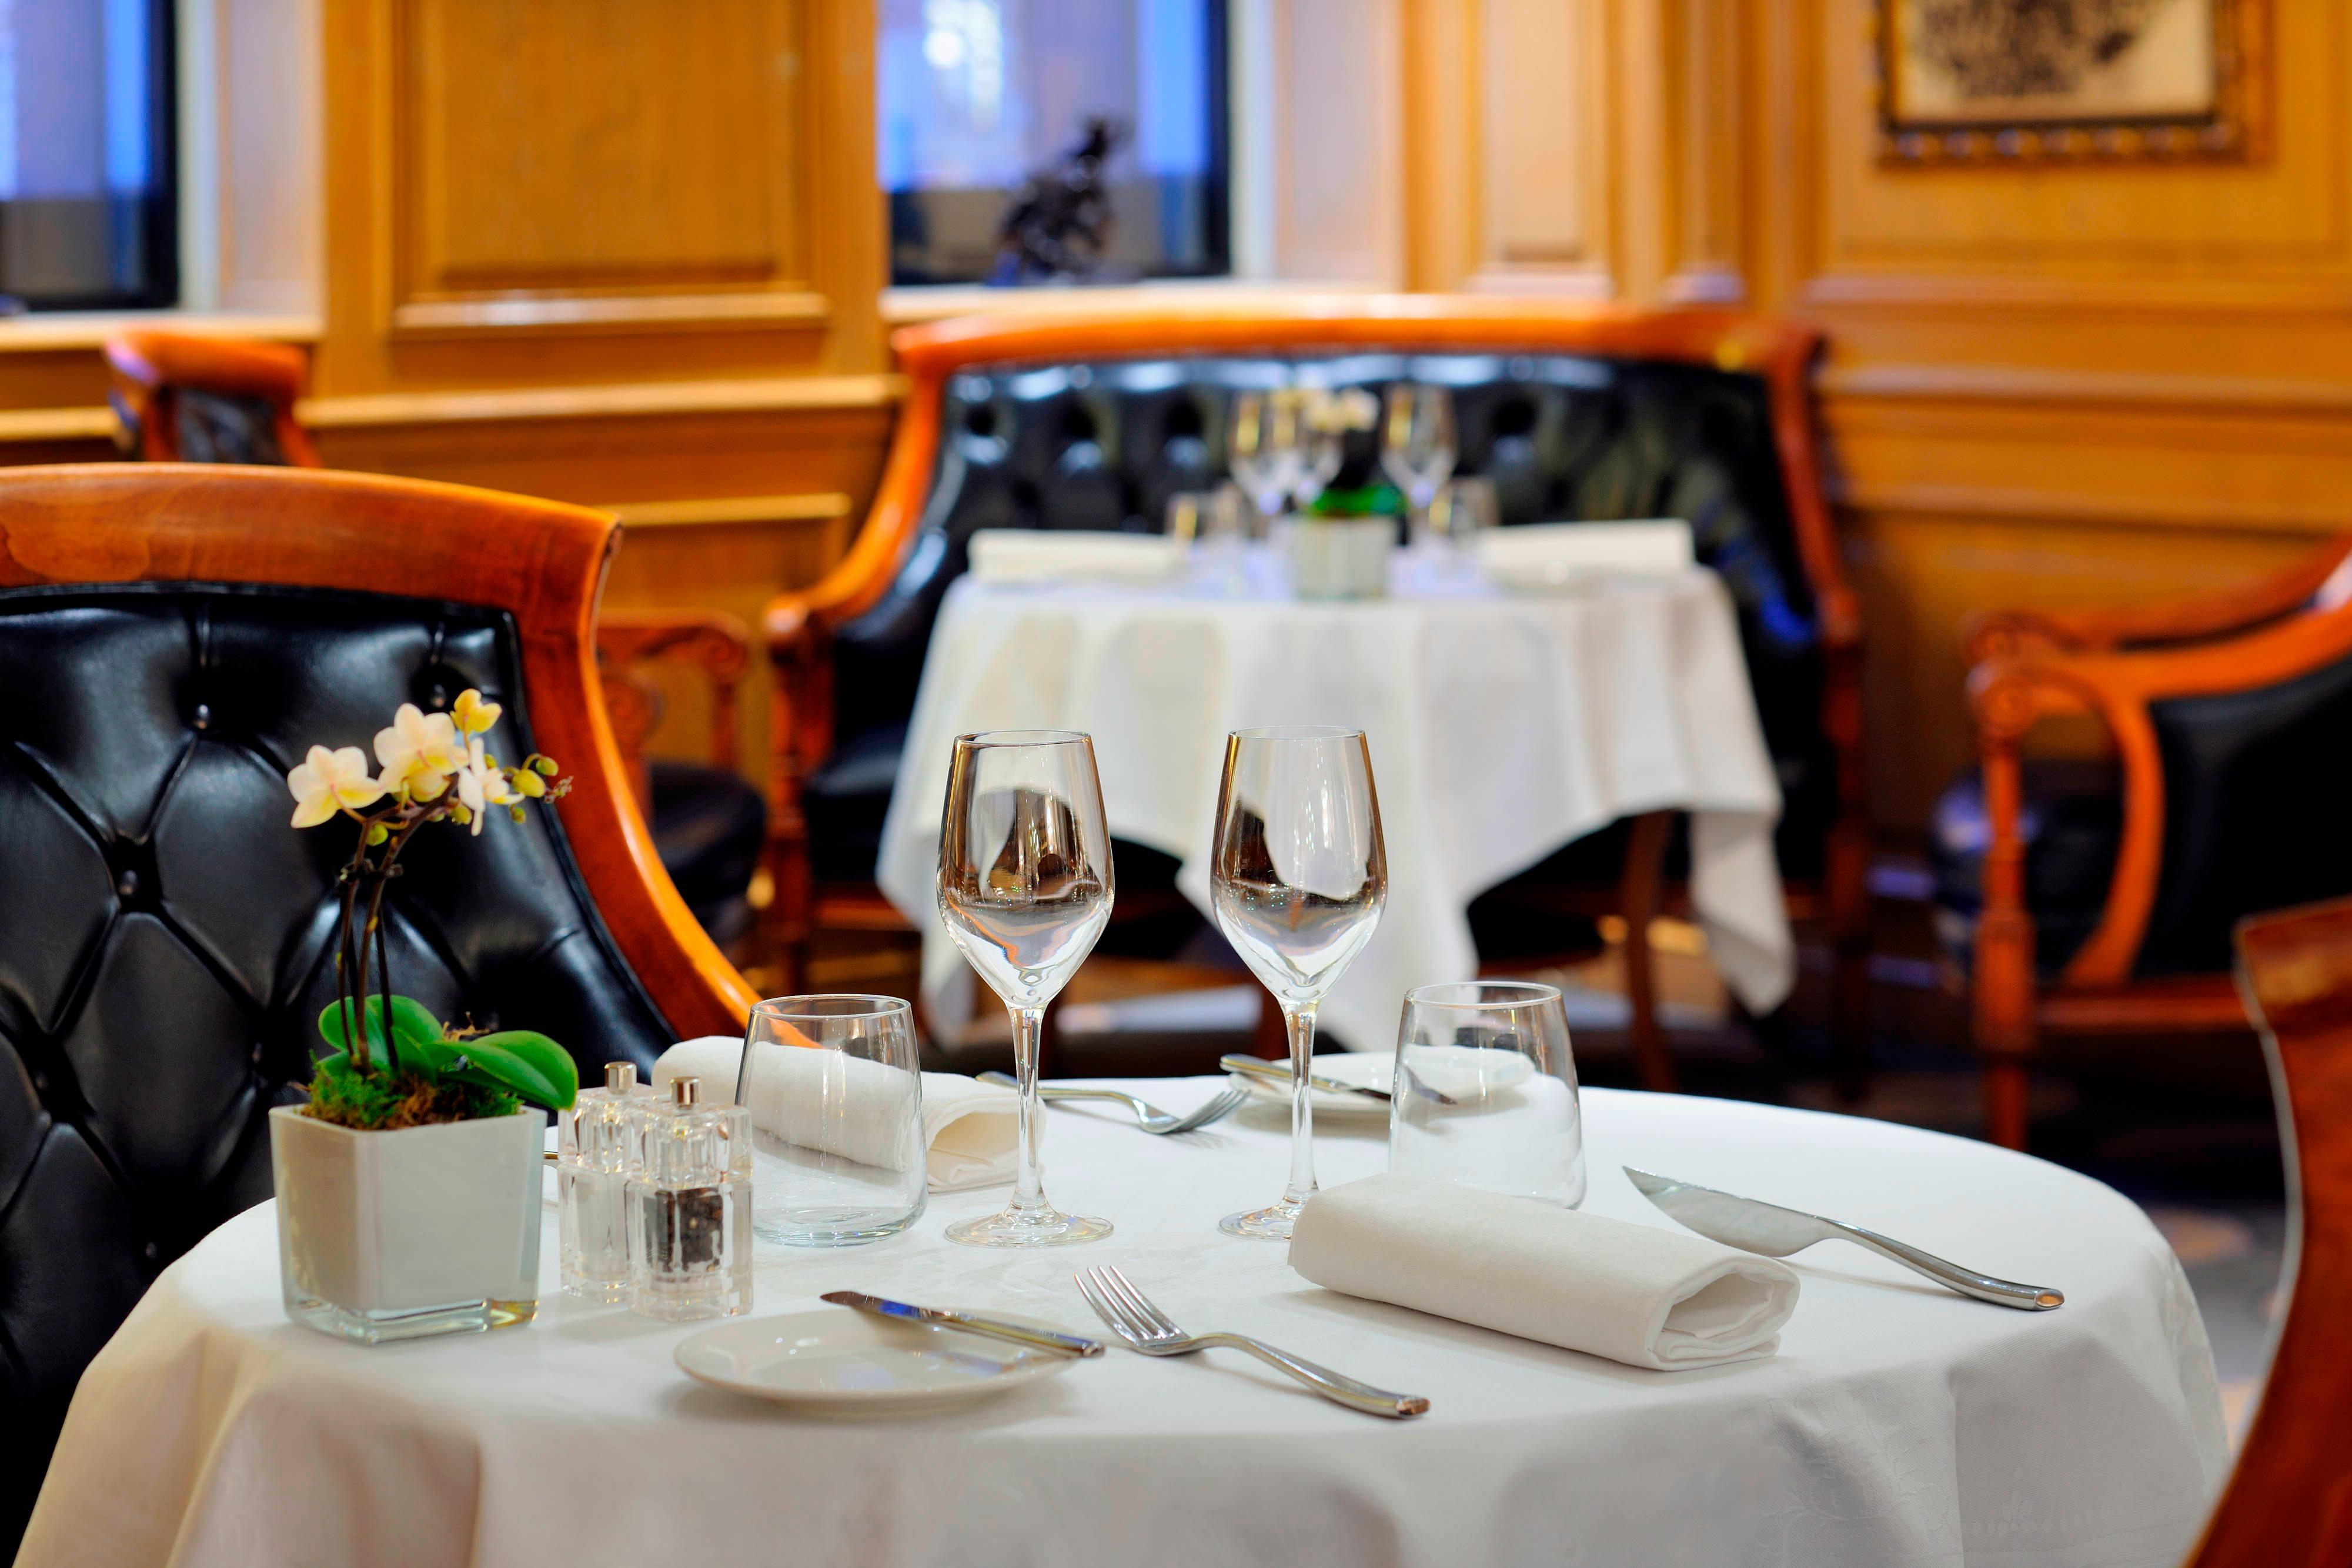 Lobby und Restaurant in Hotel an den Champs-Élysées